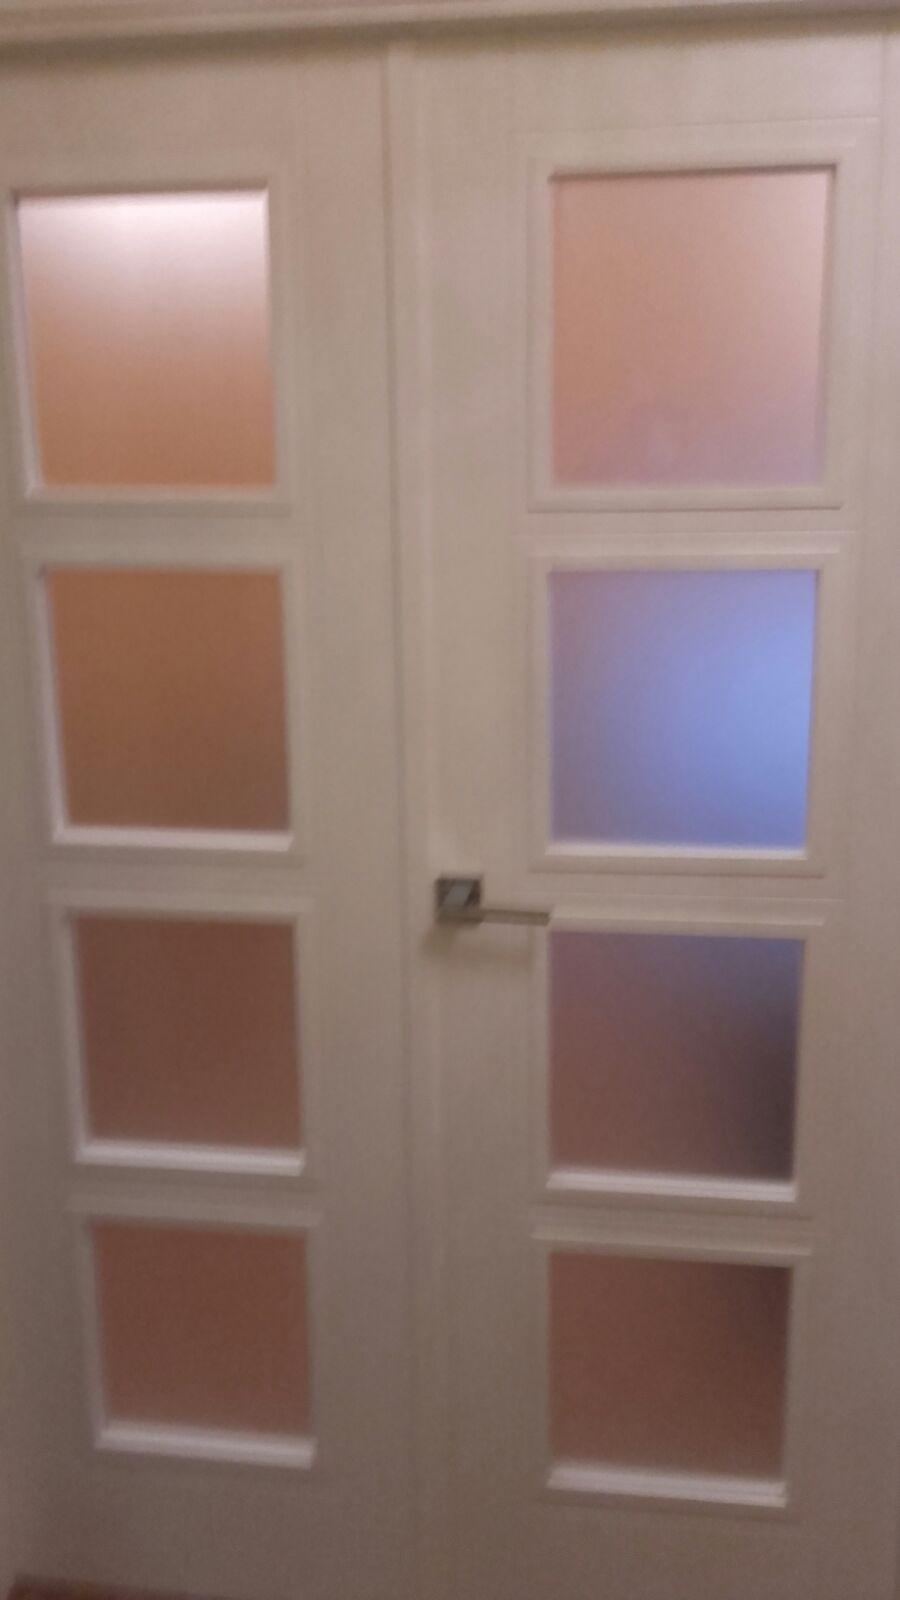 Cristales puertas interior elegant puerta de interior de - Puertas de interior con cristales ...